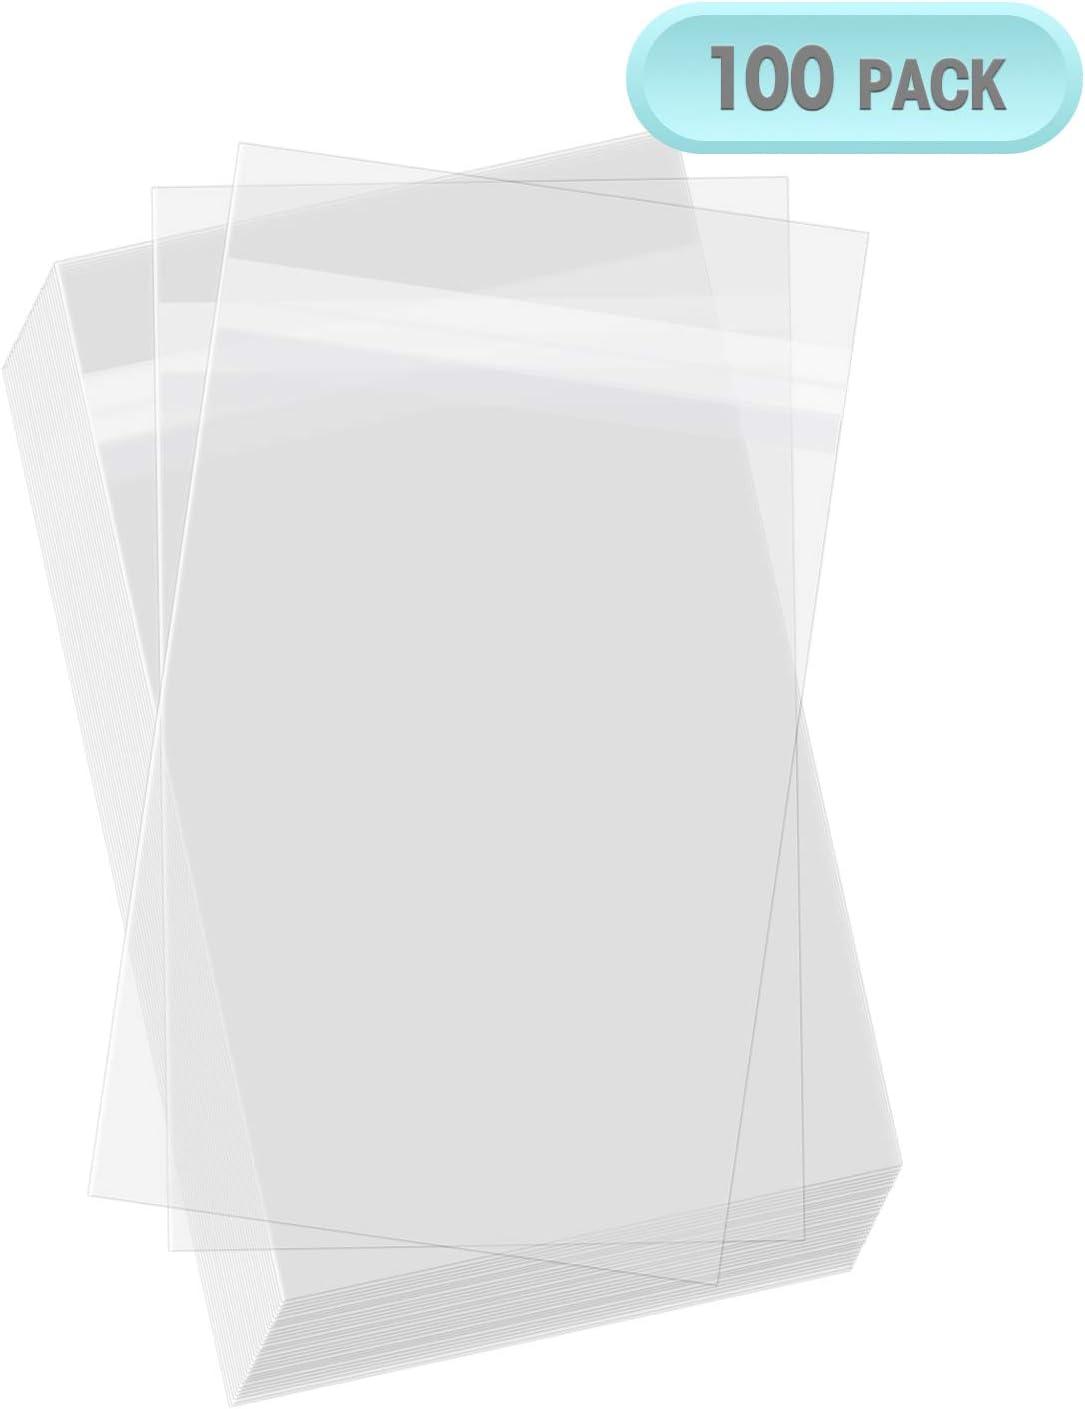 Clear Self Seal Cellophane Florist Card Bags Envelopes Various Sizes